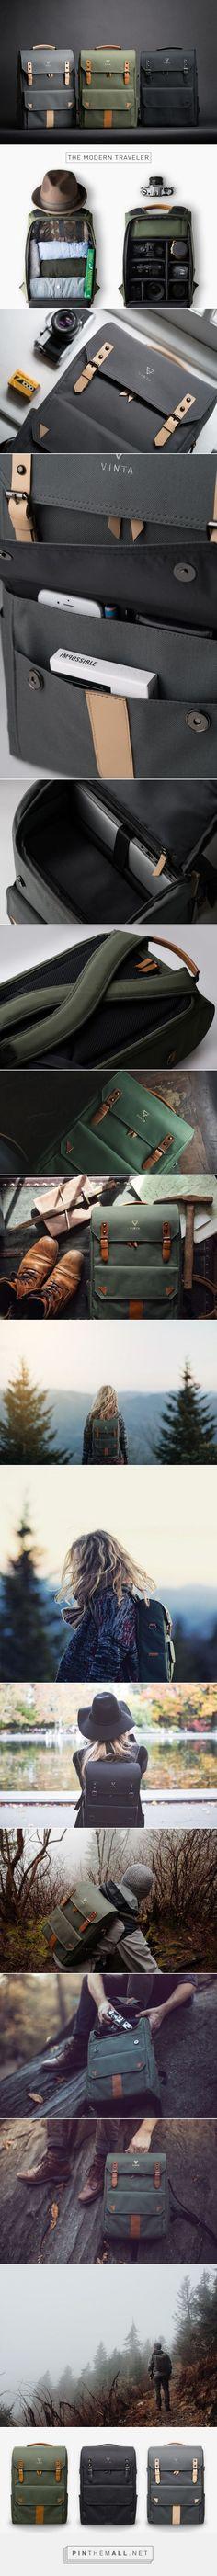 Camera Backpack - A Travel Camera Bag for Everyday Adventures - Design Milk Travel Backpack, Backpack Bags, Camera Backpack, Travel Packing, Camera Bags, Camera Gear, Messenger Bags, Travel Luggage, Tote Bag